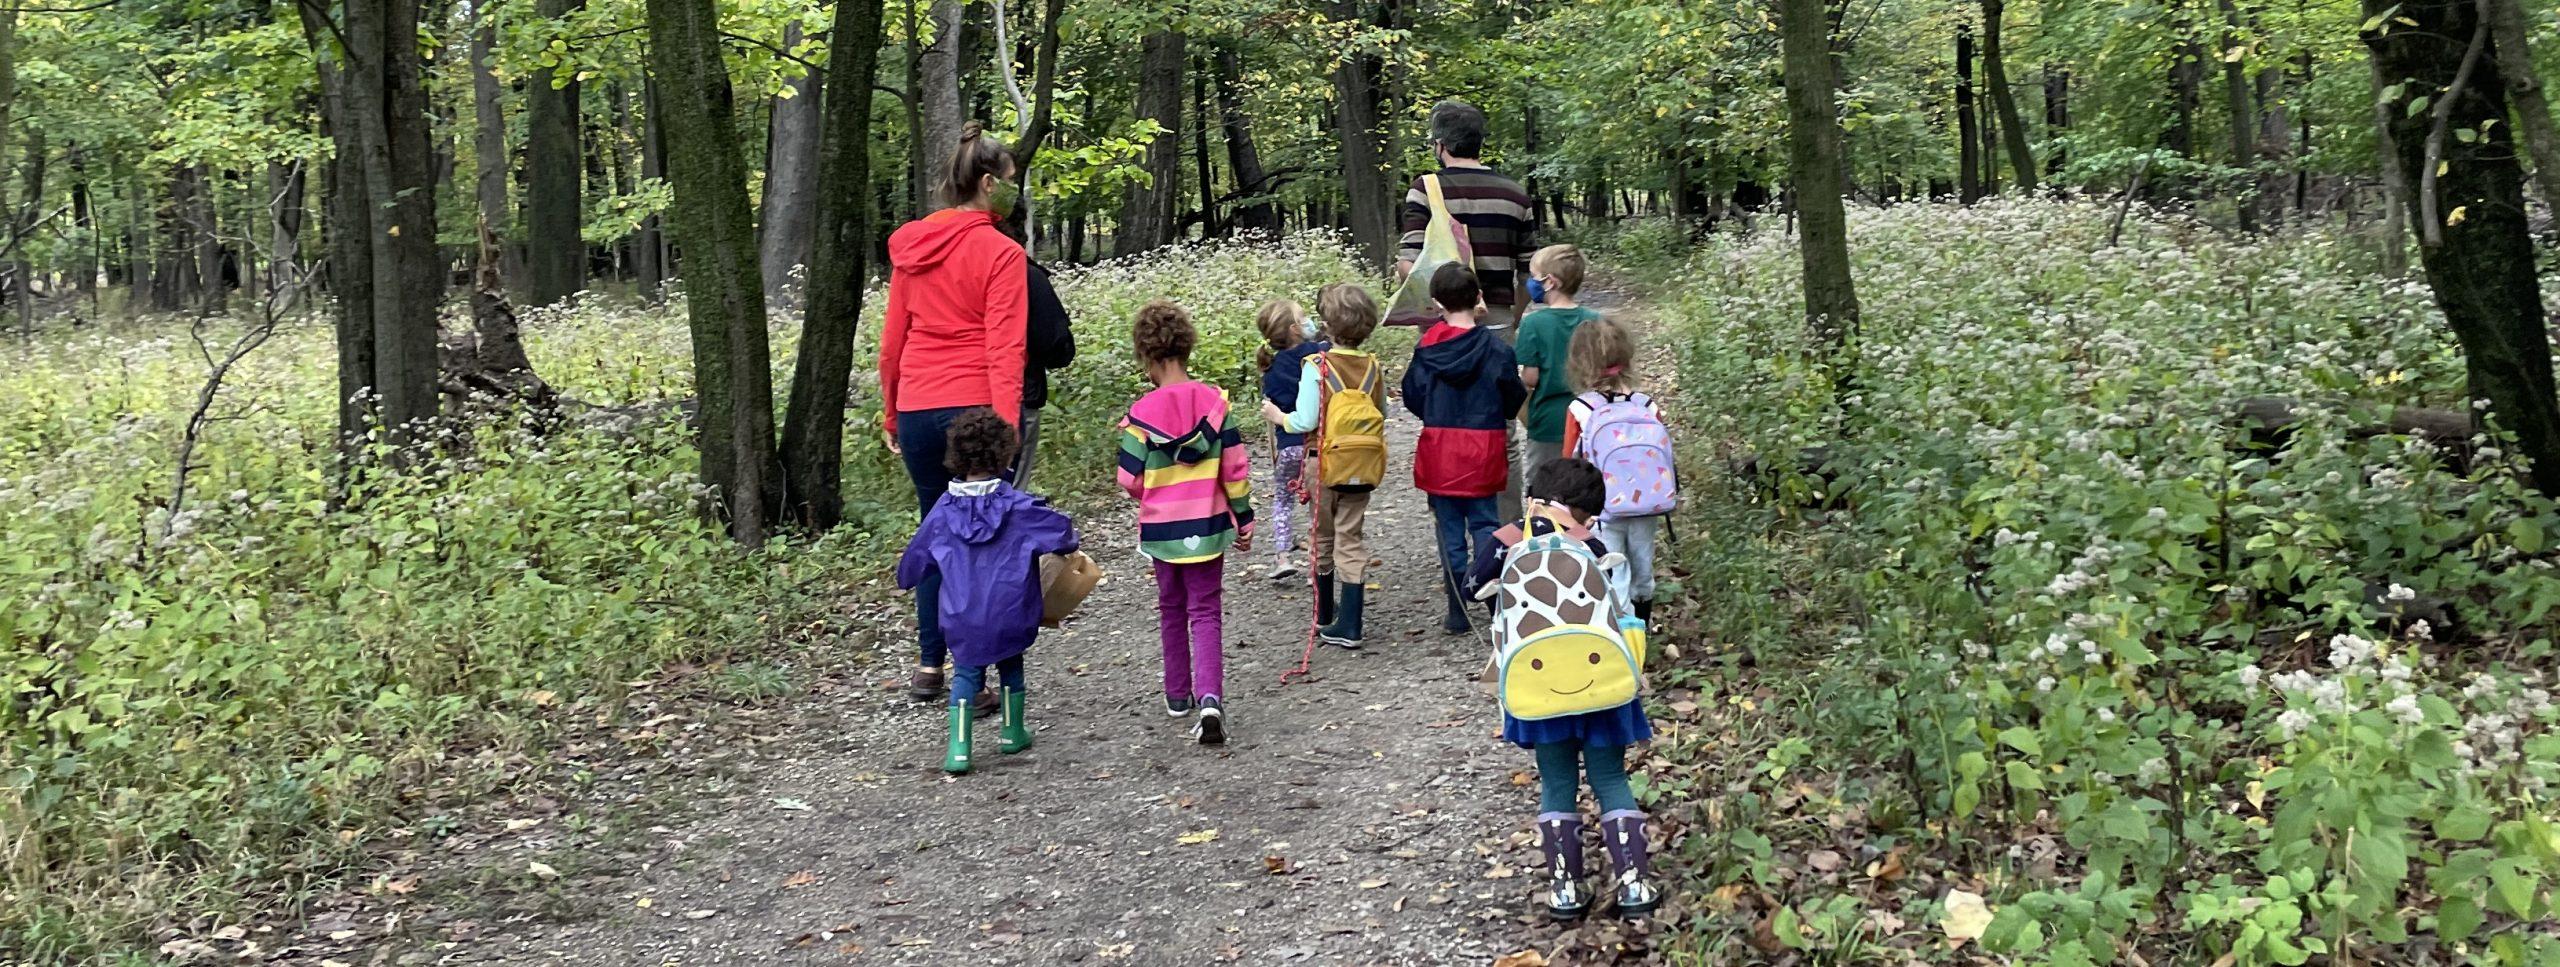 Community Organization for Near West Homeschoolers